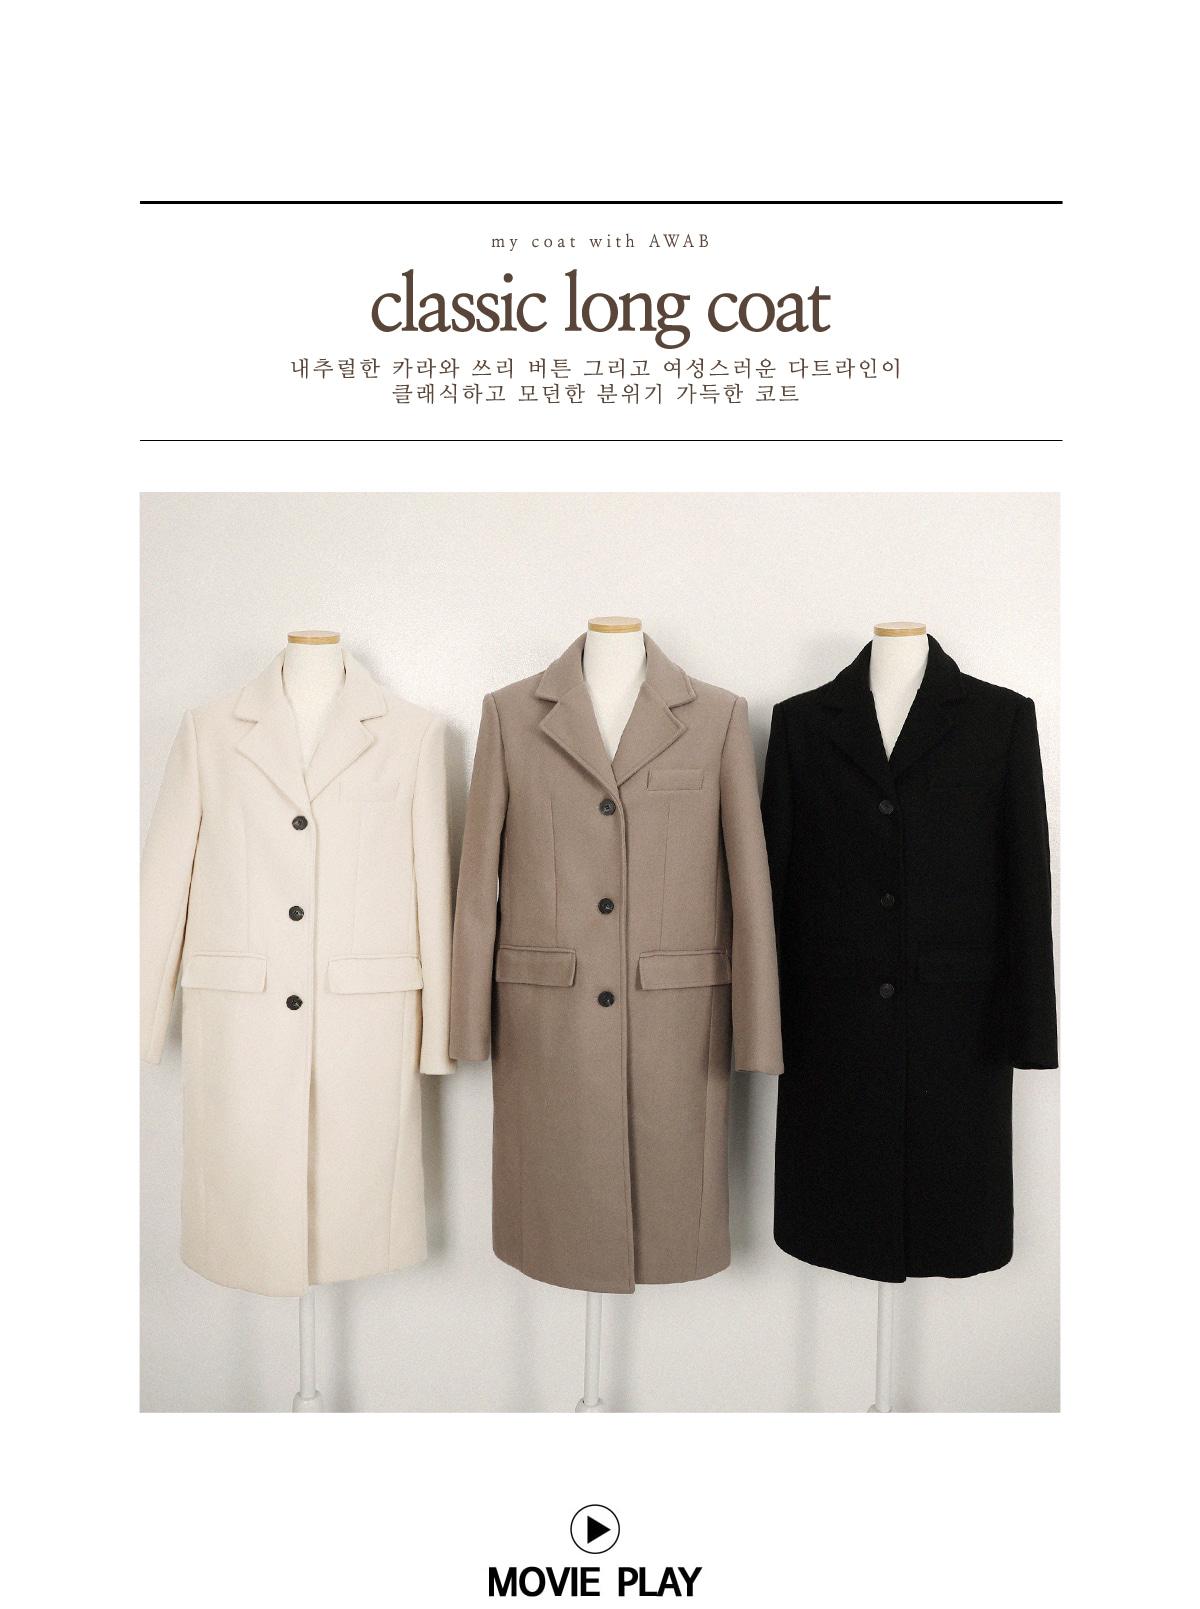 Dion dart long coat